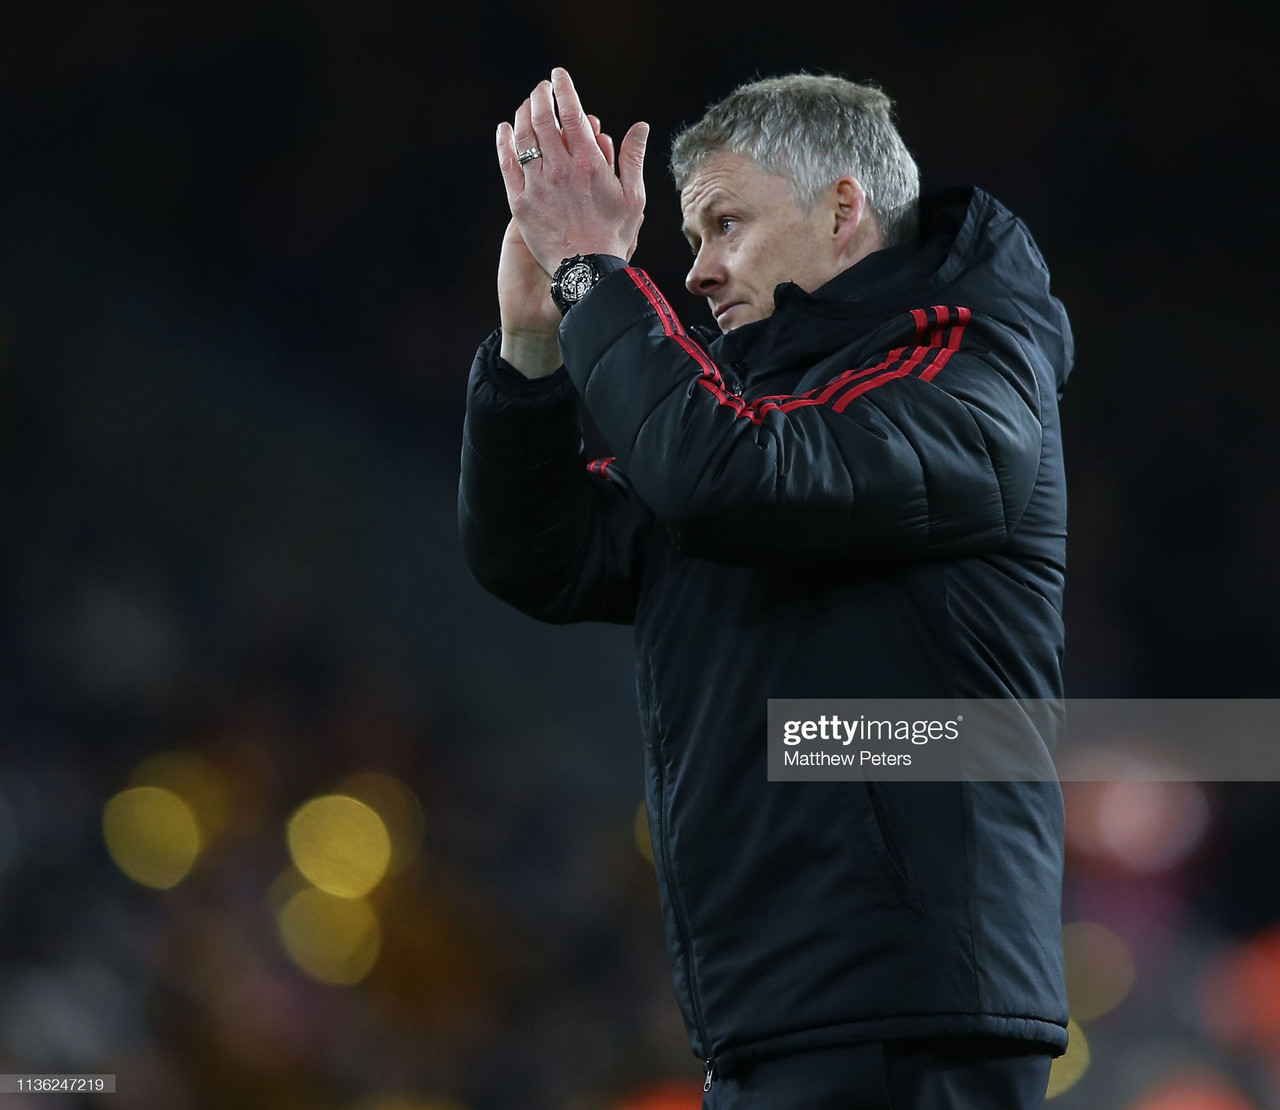 Wolves vs Manchester United: Solskjaer's pre-match comments